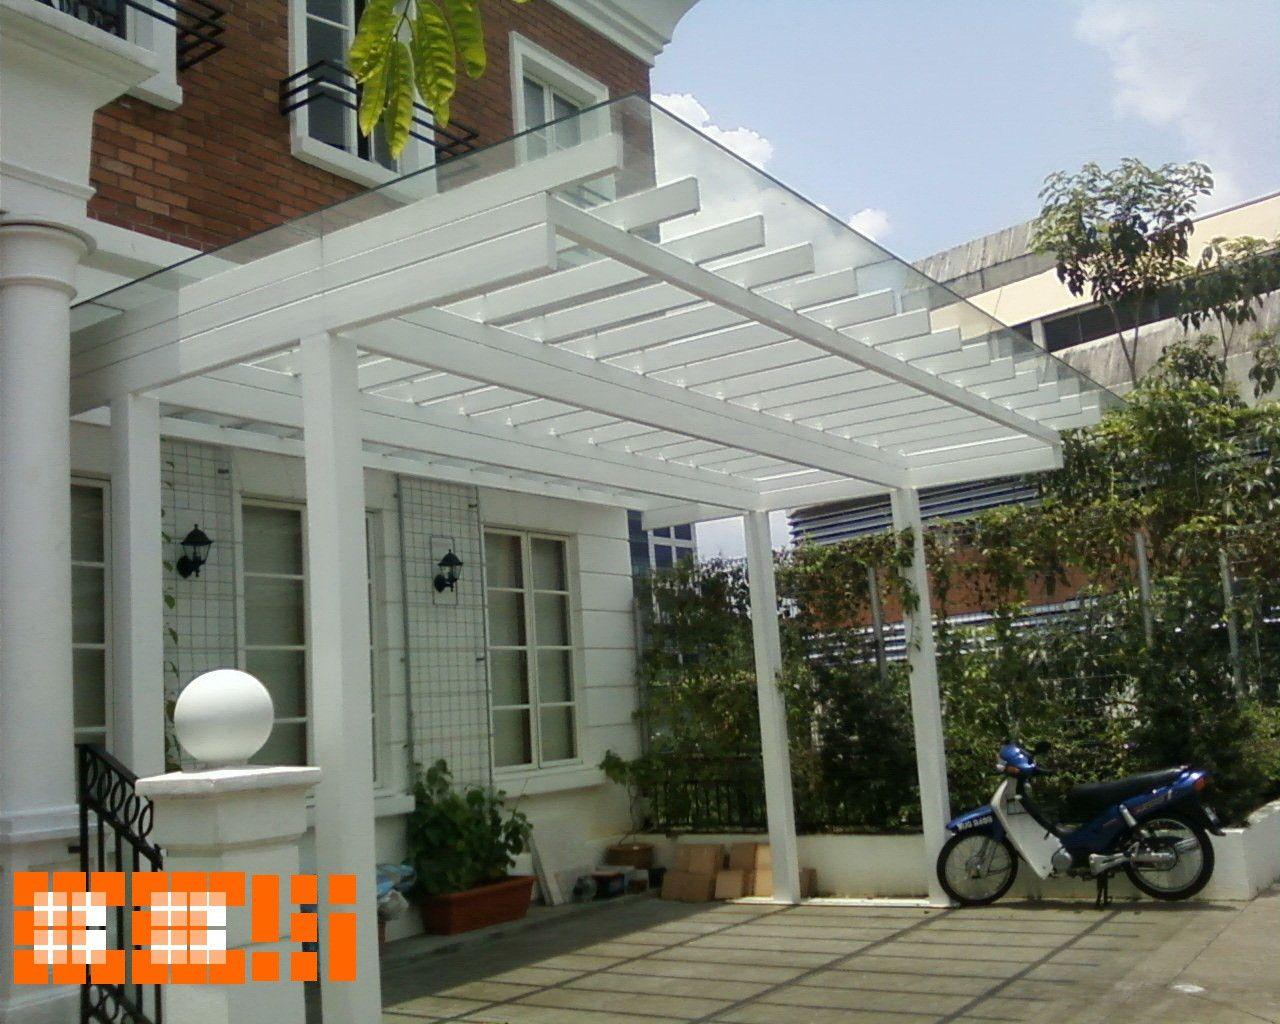 Kanopi Unik Baja Ringan 38 Images Of A Minimalist Home Canopy Model Design